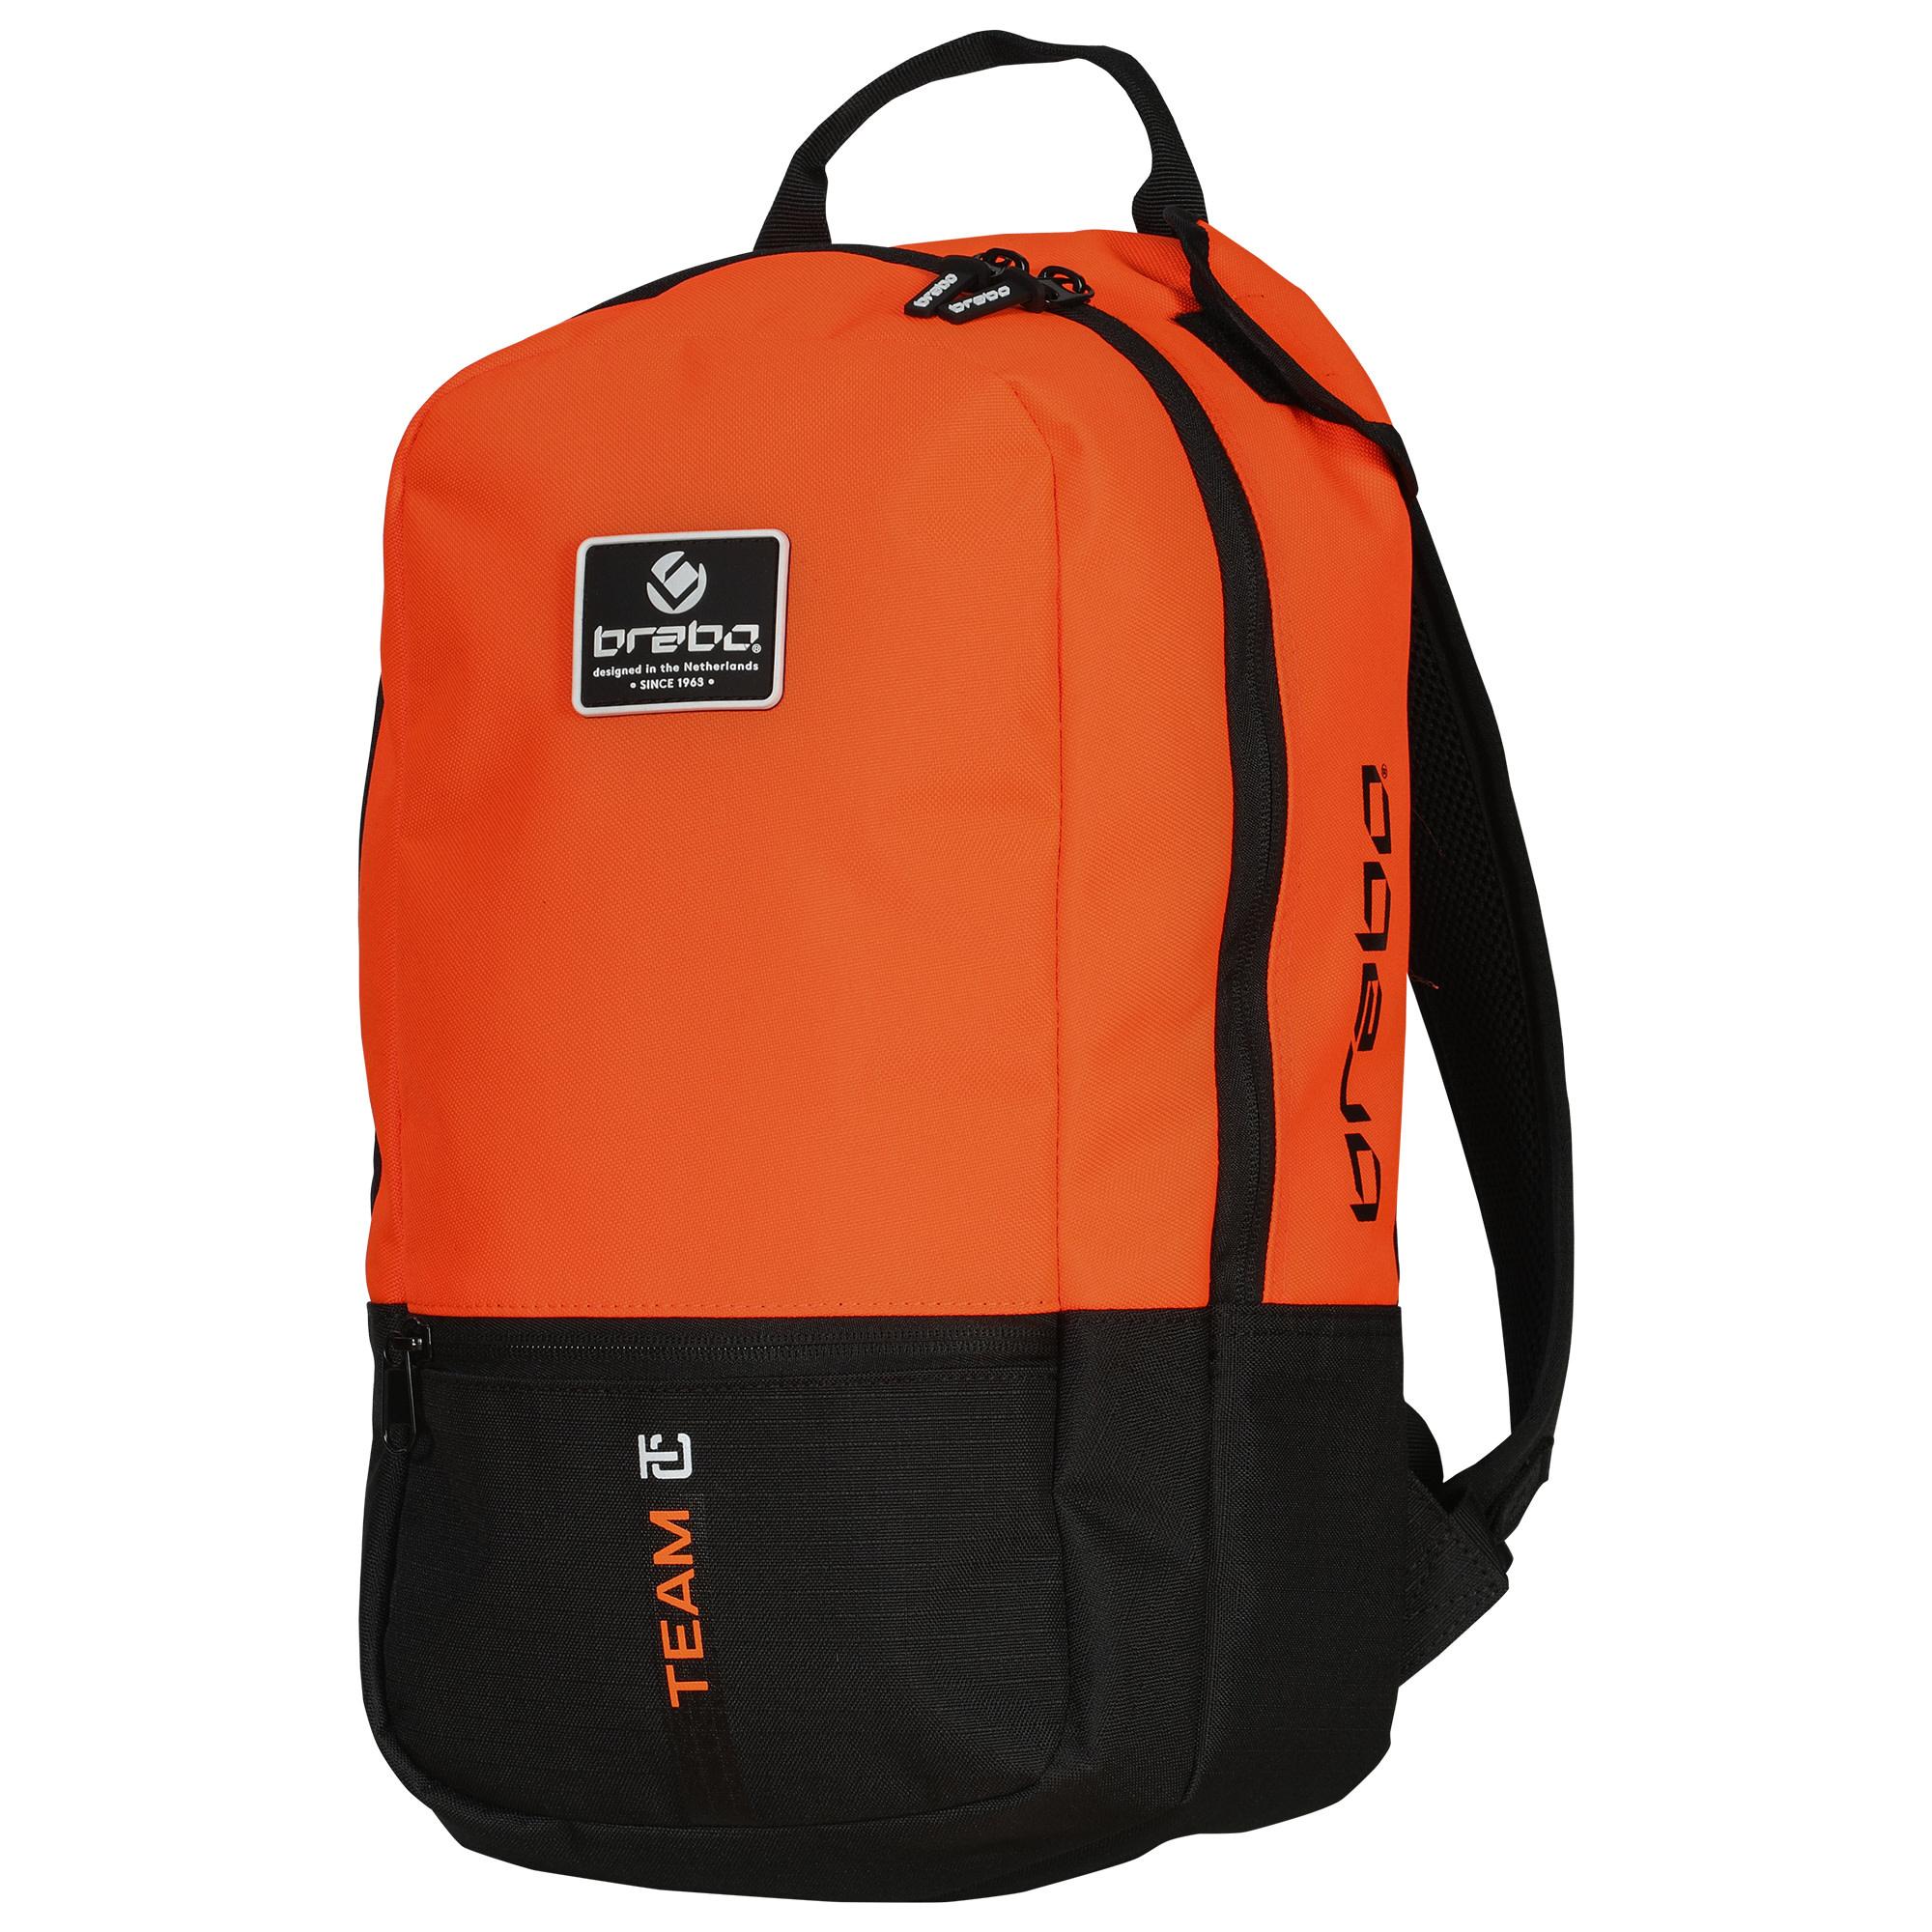 b5b0208bb5f2c1 Brabo Backpack Team TC Junior Zwart/Oranje 19/20 kopen? - Hockeypoint